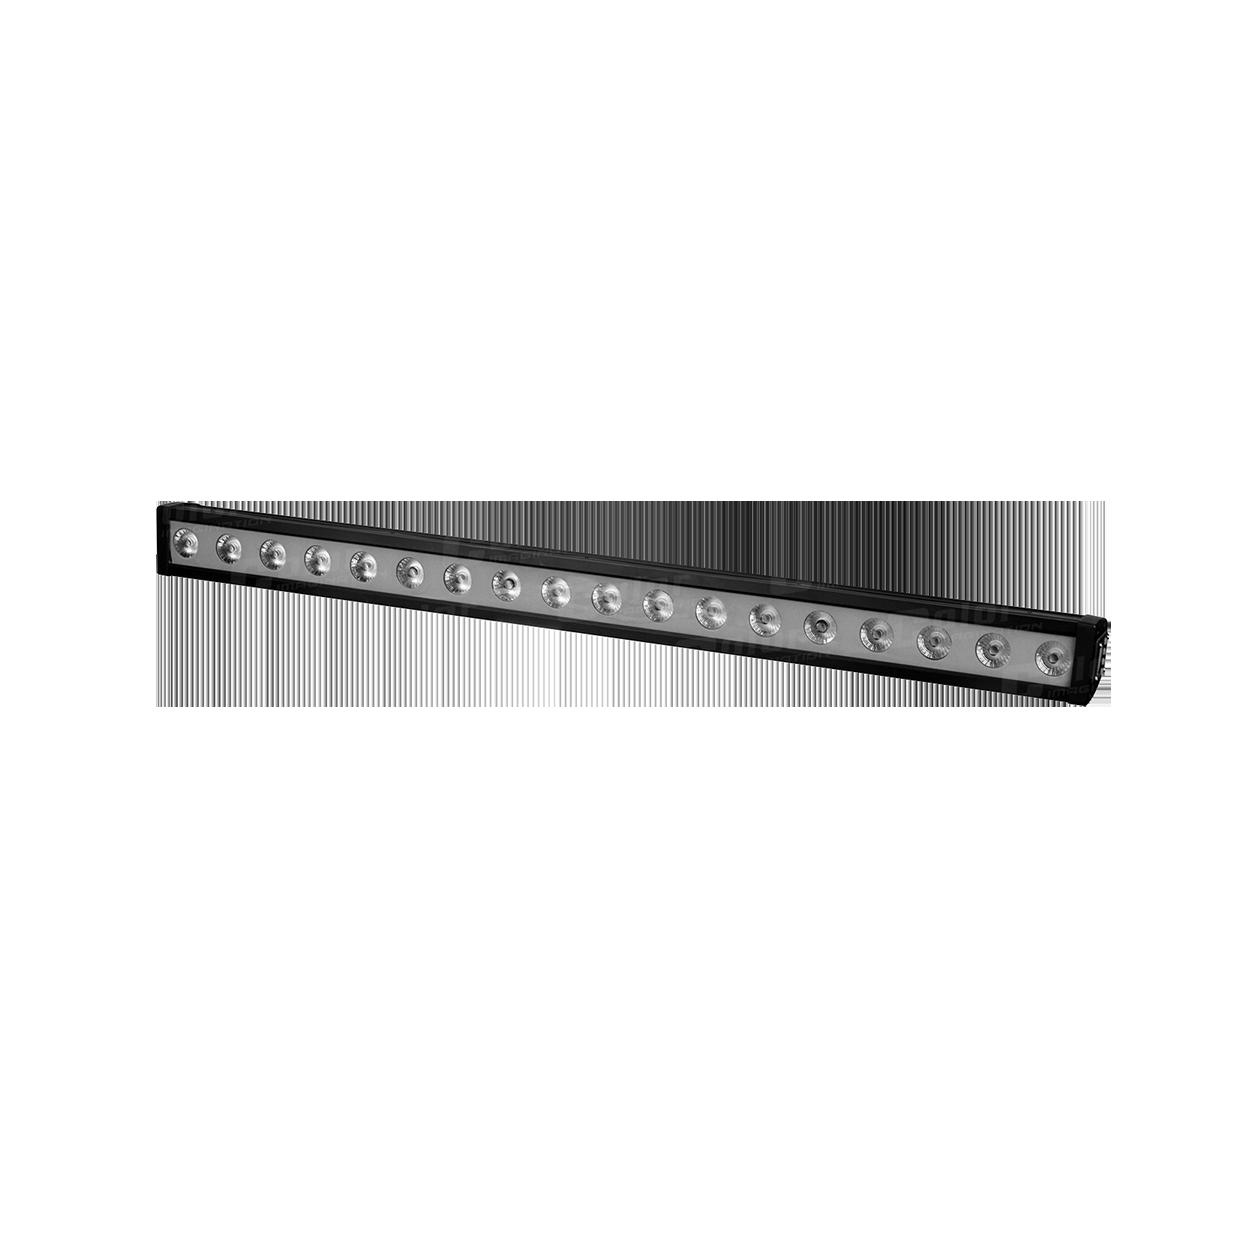 Architectural Flood Light Manufacturers Architectural Indoor Lighting Architectural Lighting Companies